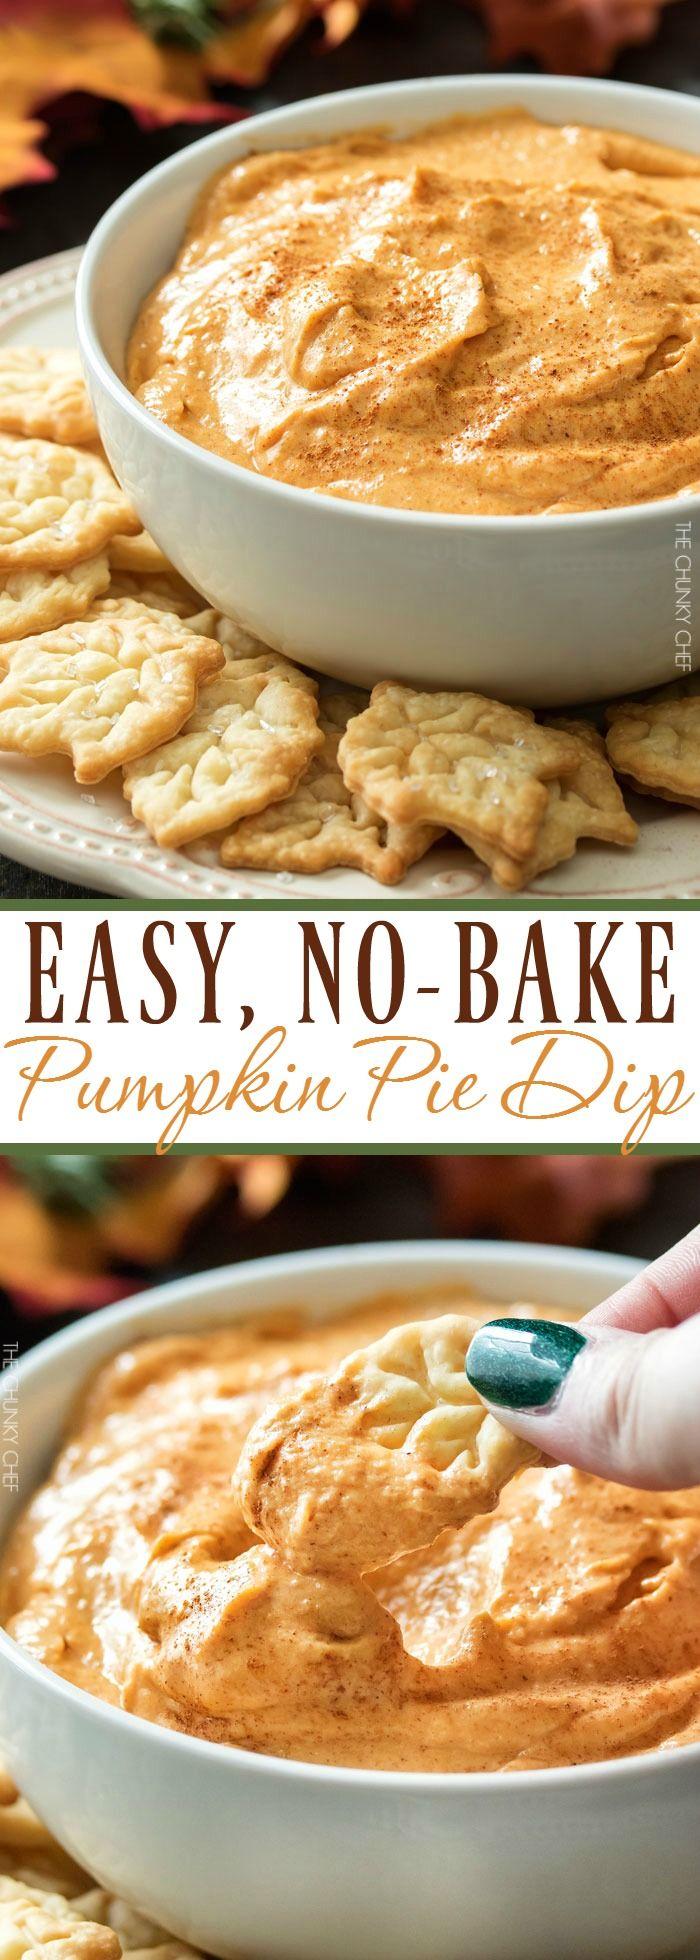 Pumpkin Pie Dip | This dip is no bake, and tastes just like a great pumpkin pie…